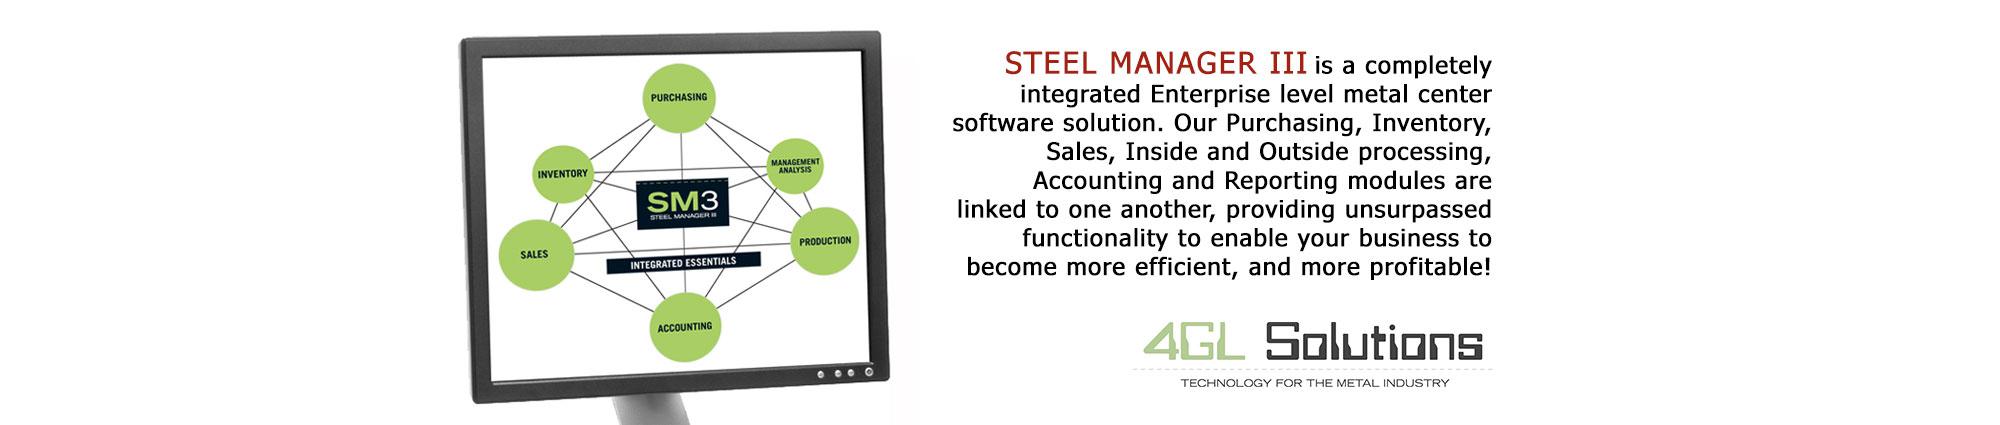 Steel Manager III Slide